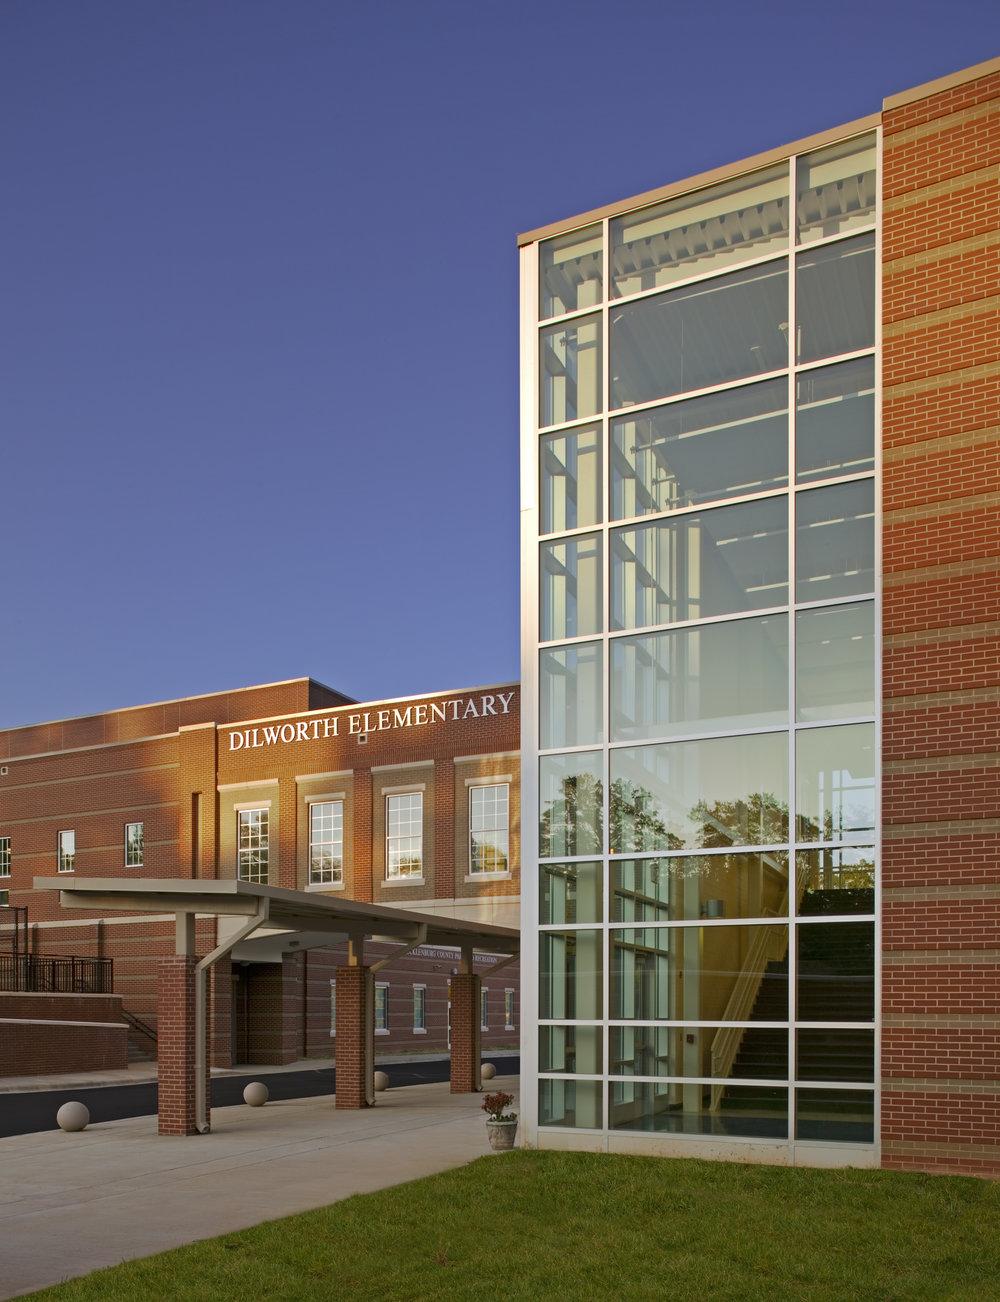 ADW-K-12-Education-Dilworth-Elementary-School-Charlotte-NC-Exterior-1.jpg